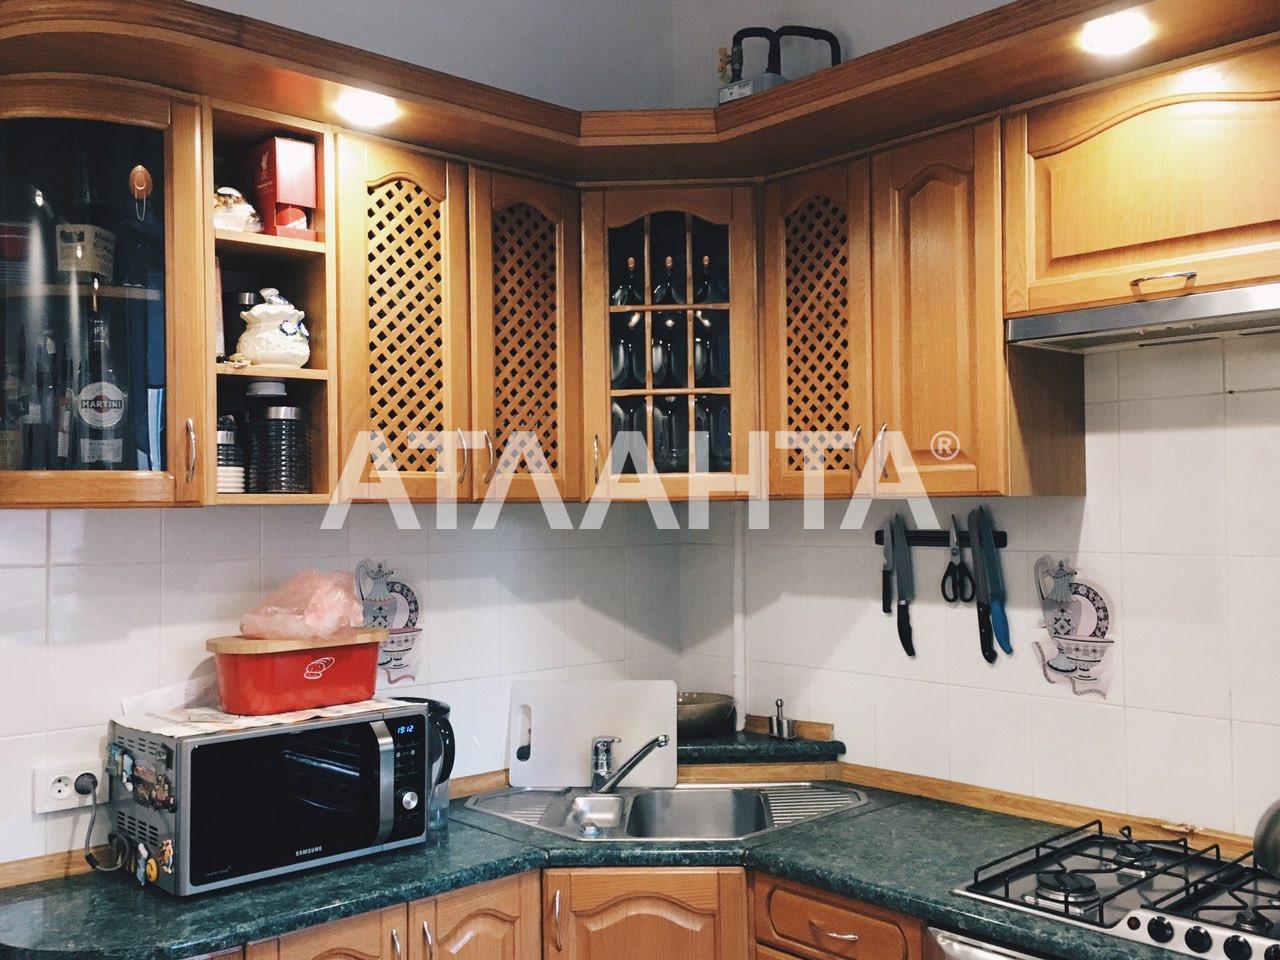 Продается 2-комнатная Квартира на ул. Семинарская (Гамарника) — 75 000 у.е. (фото №8)